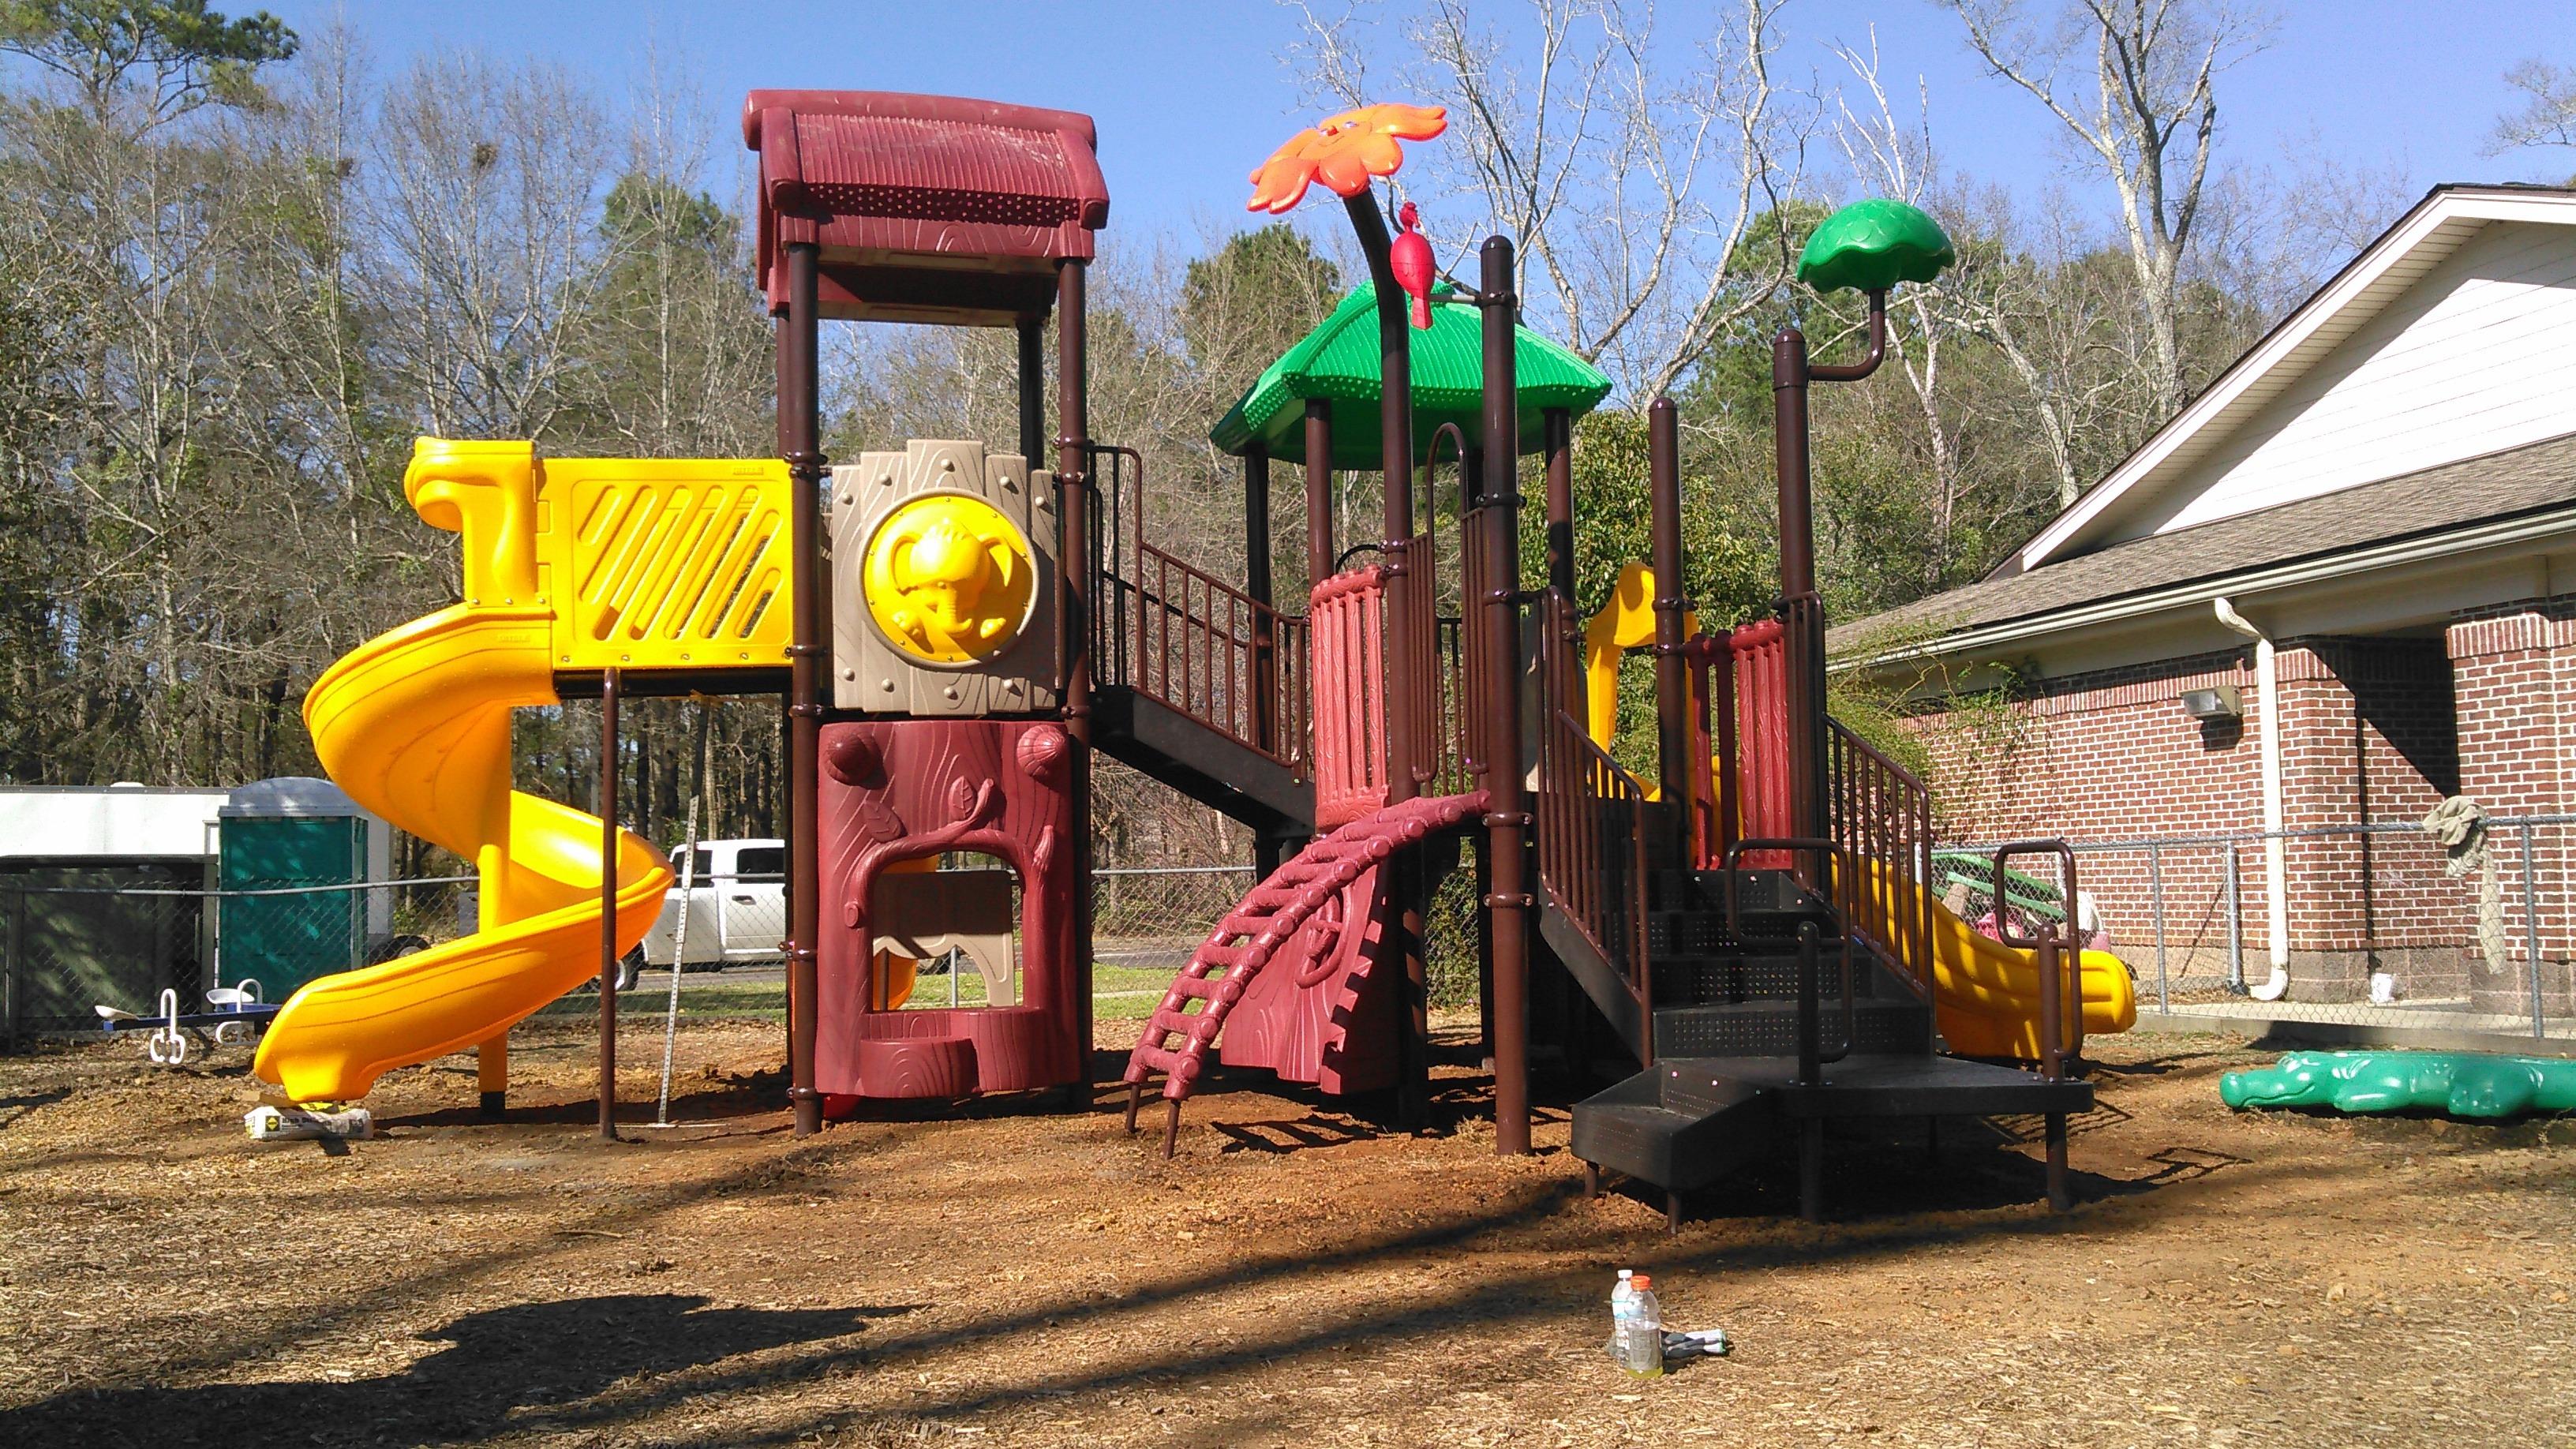 Mobile Alabama Childcare Center Playground Equipment Pro